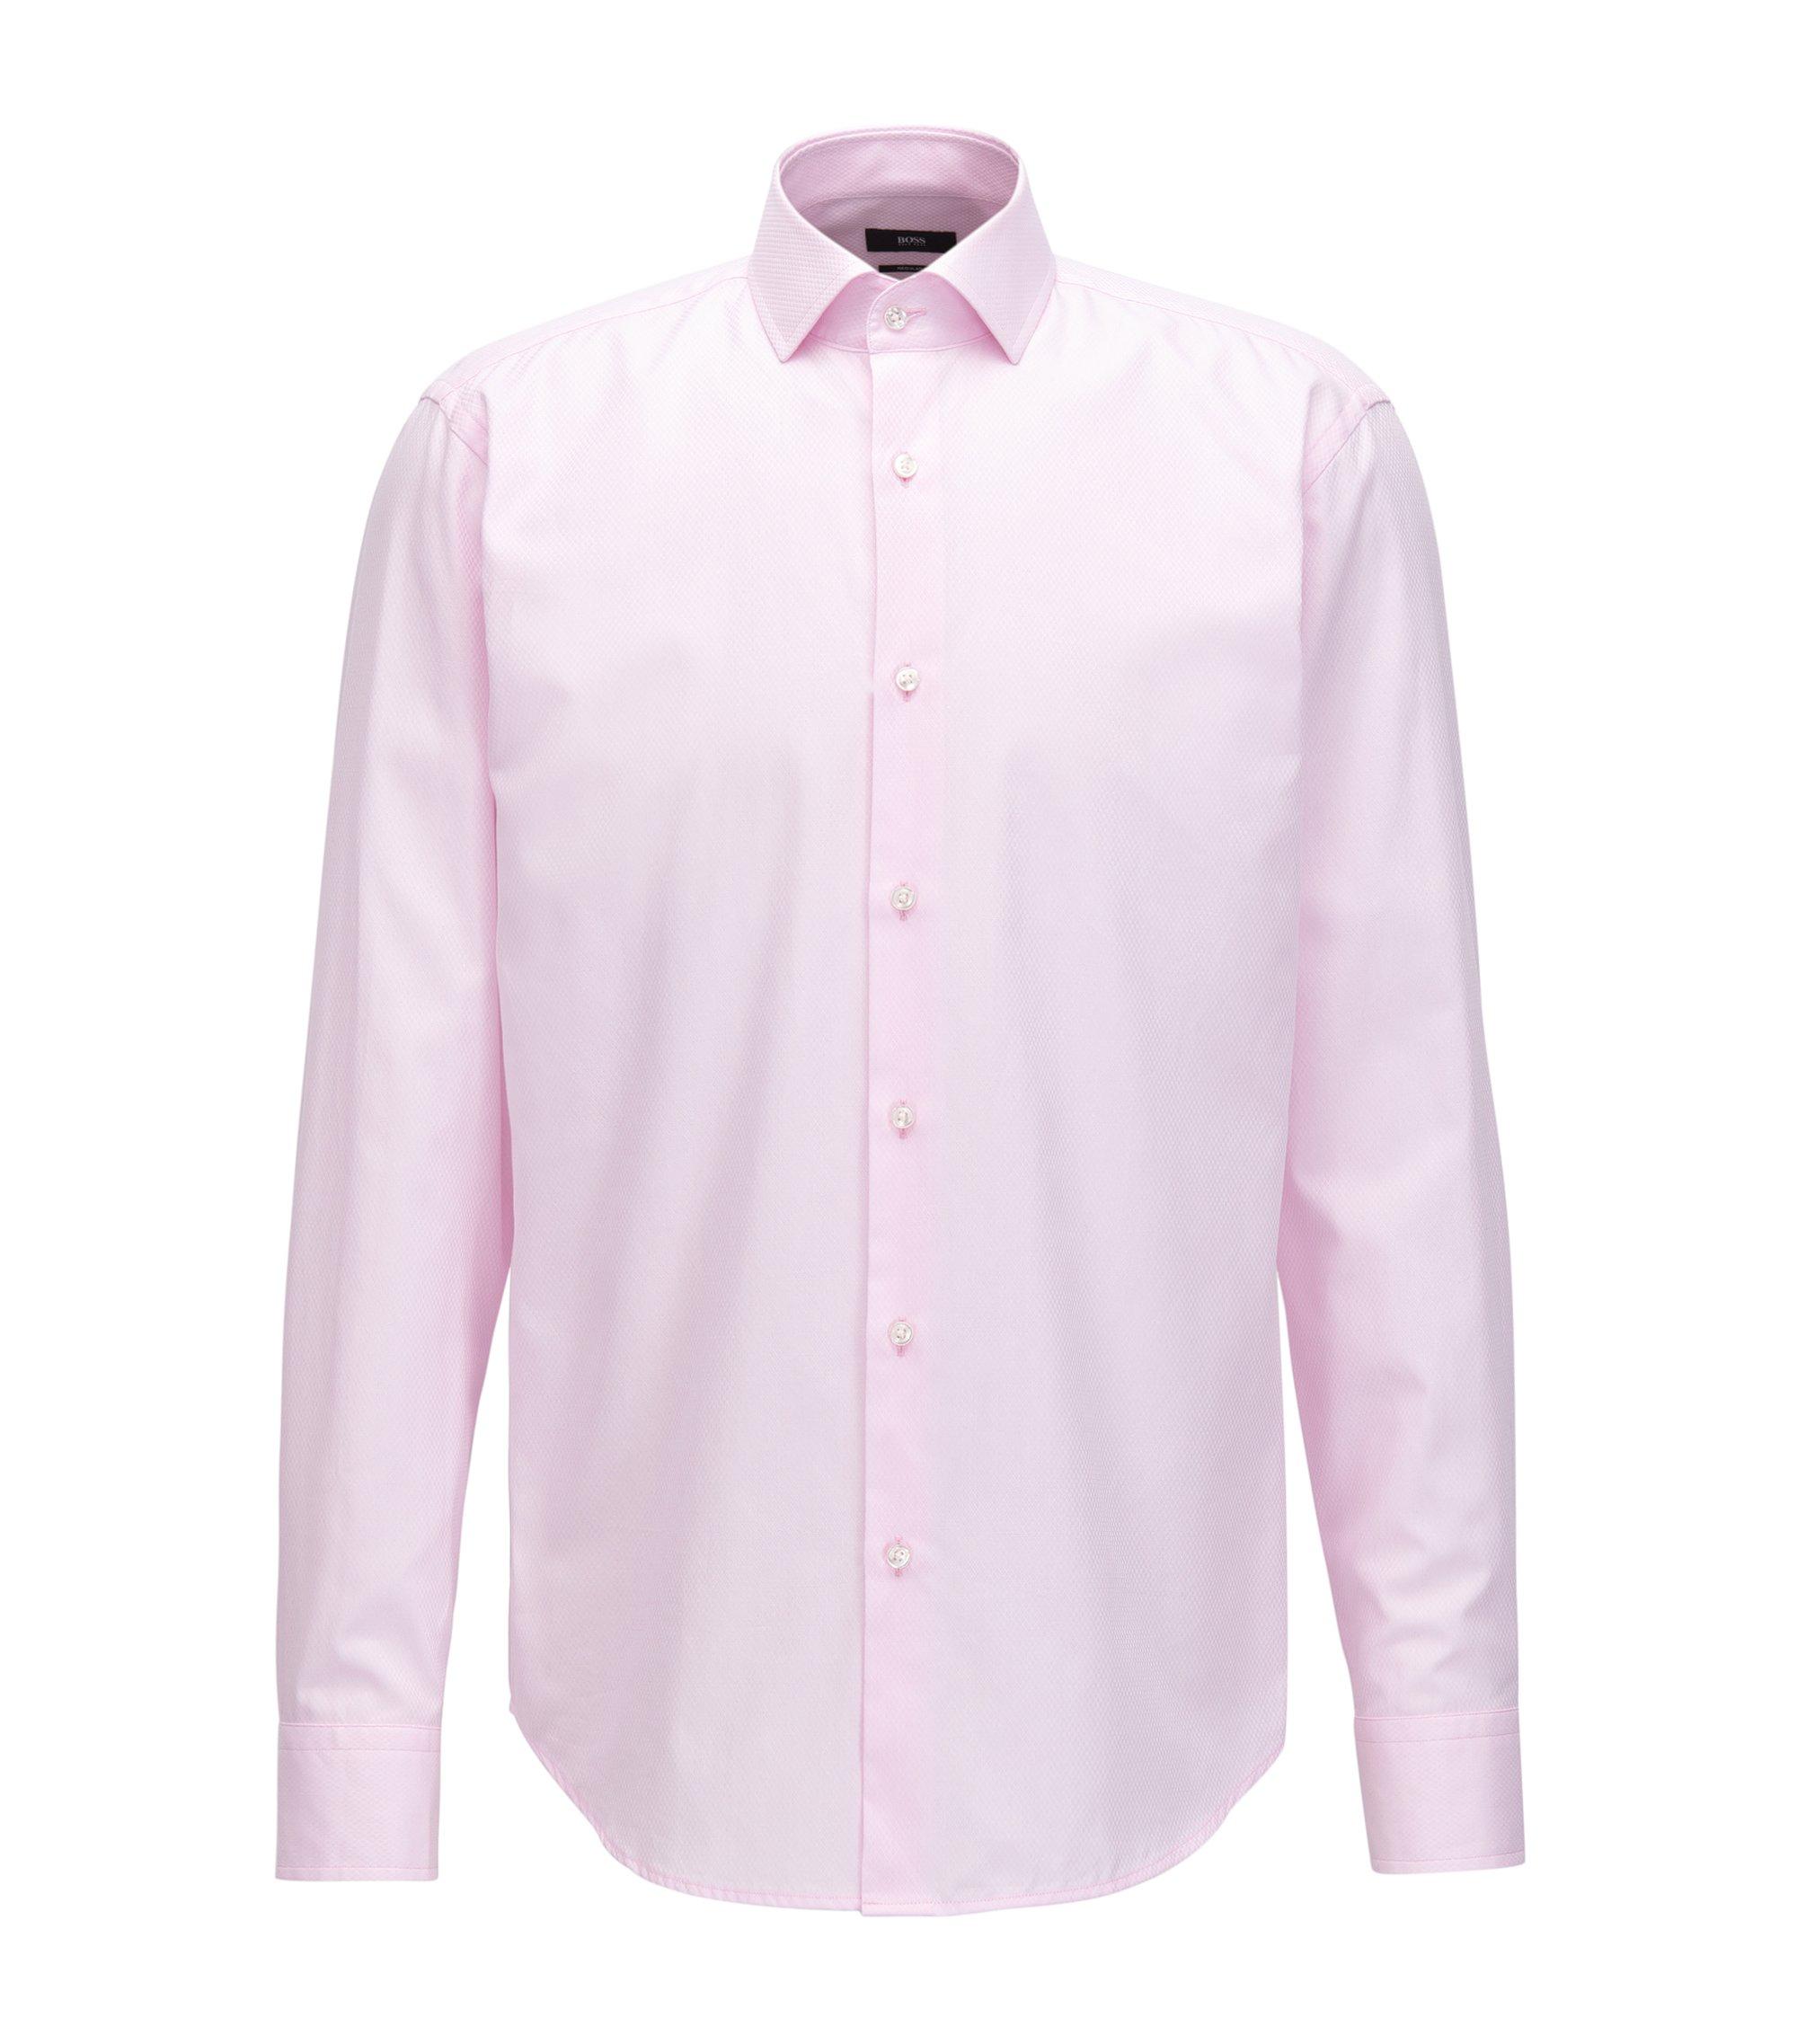 Regular-fit shirt in patterned cotton, light pink